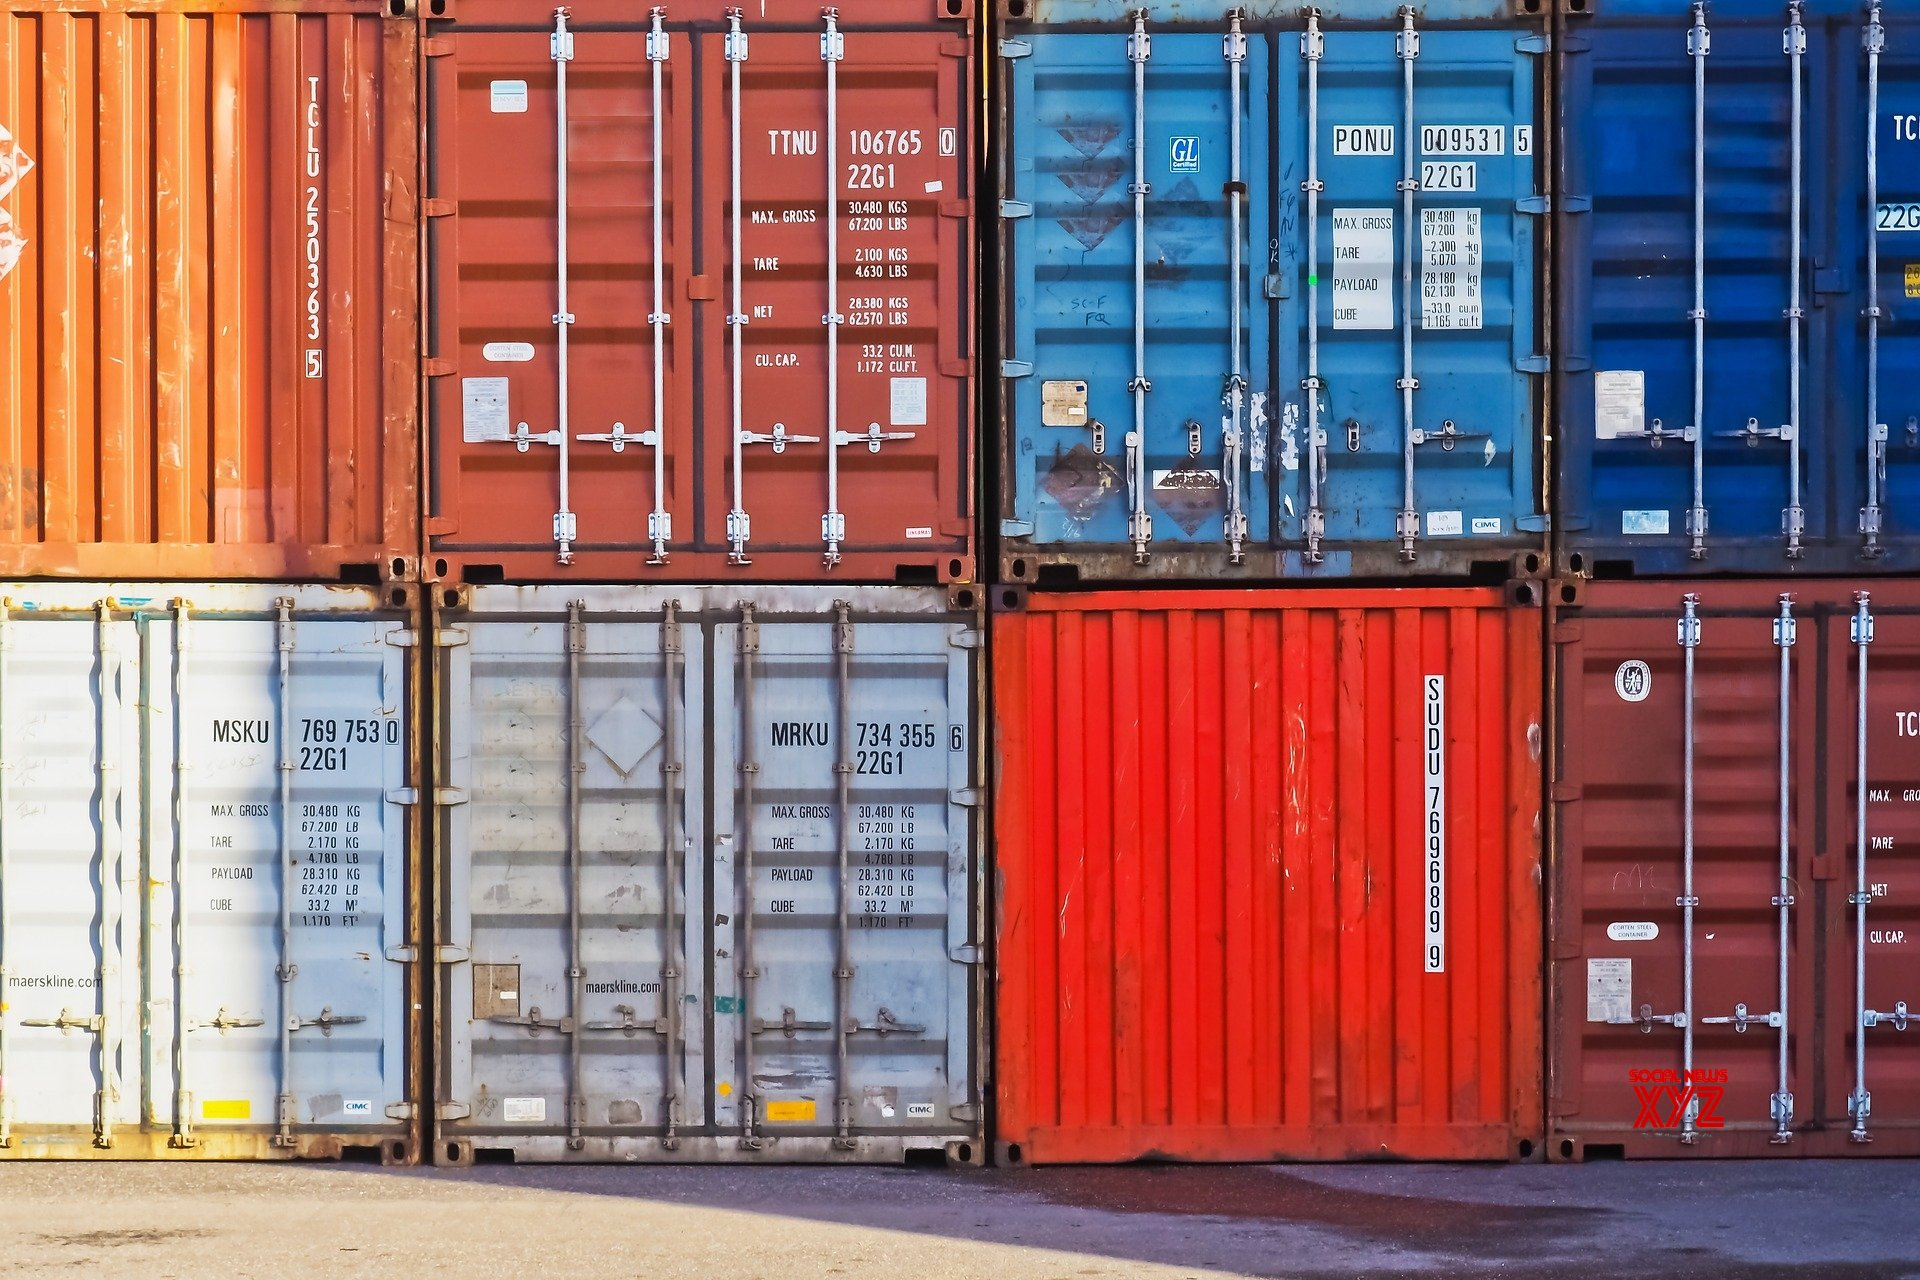 India's September exports, imports rise YoY